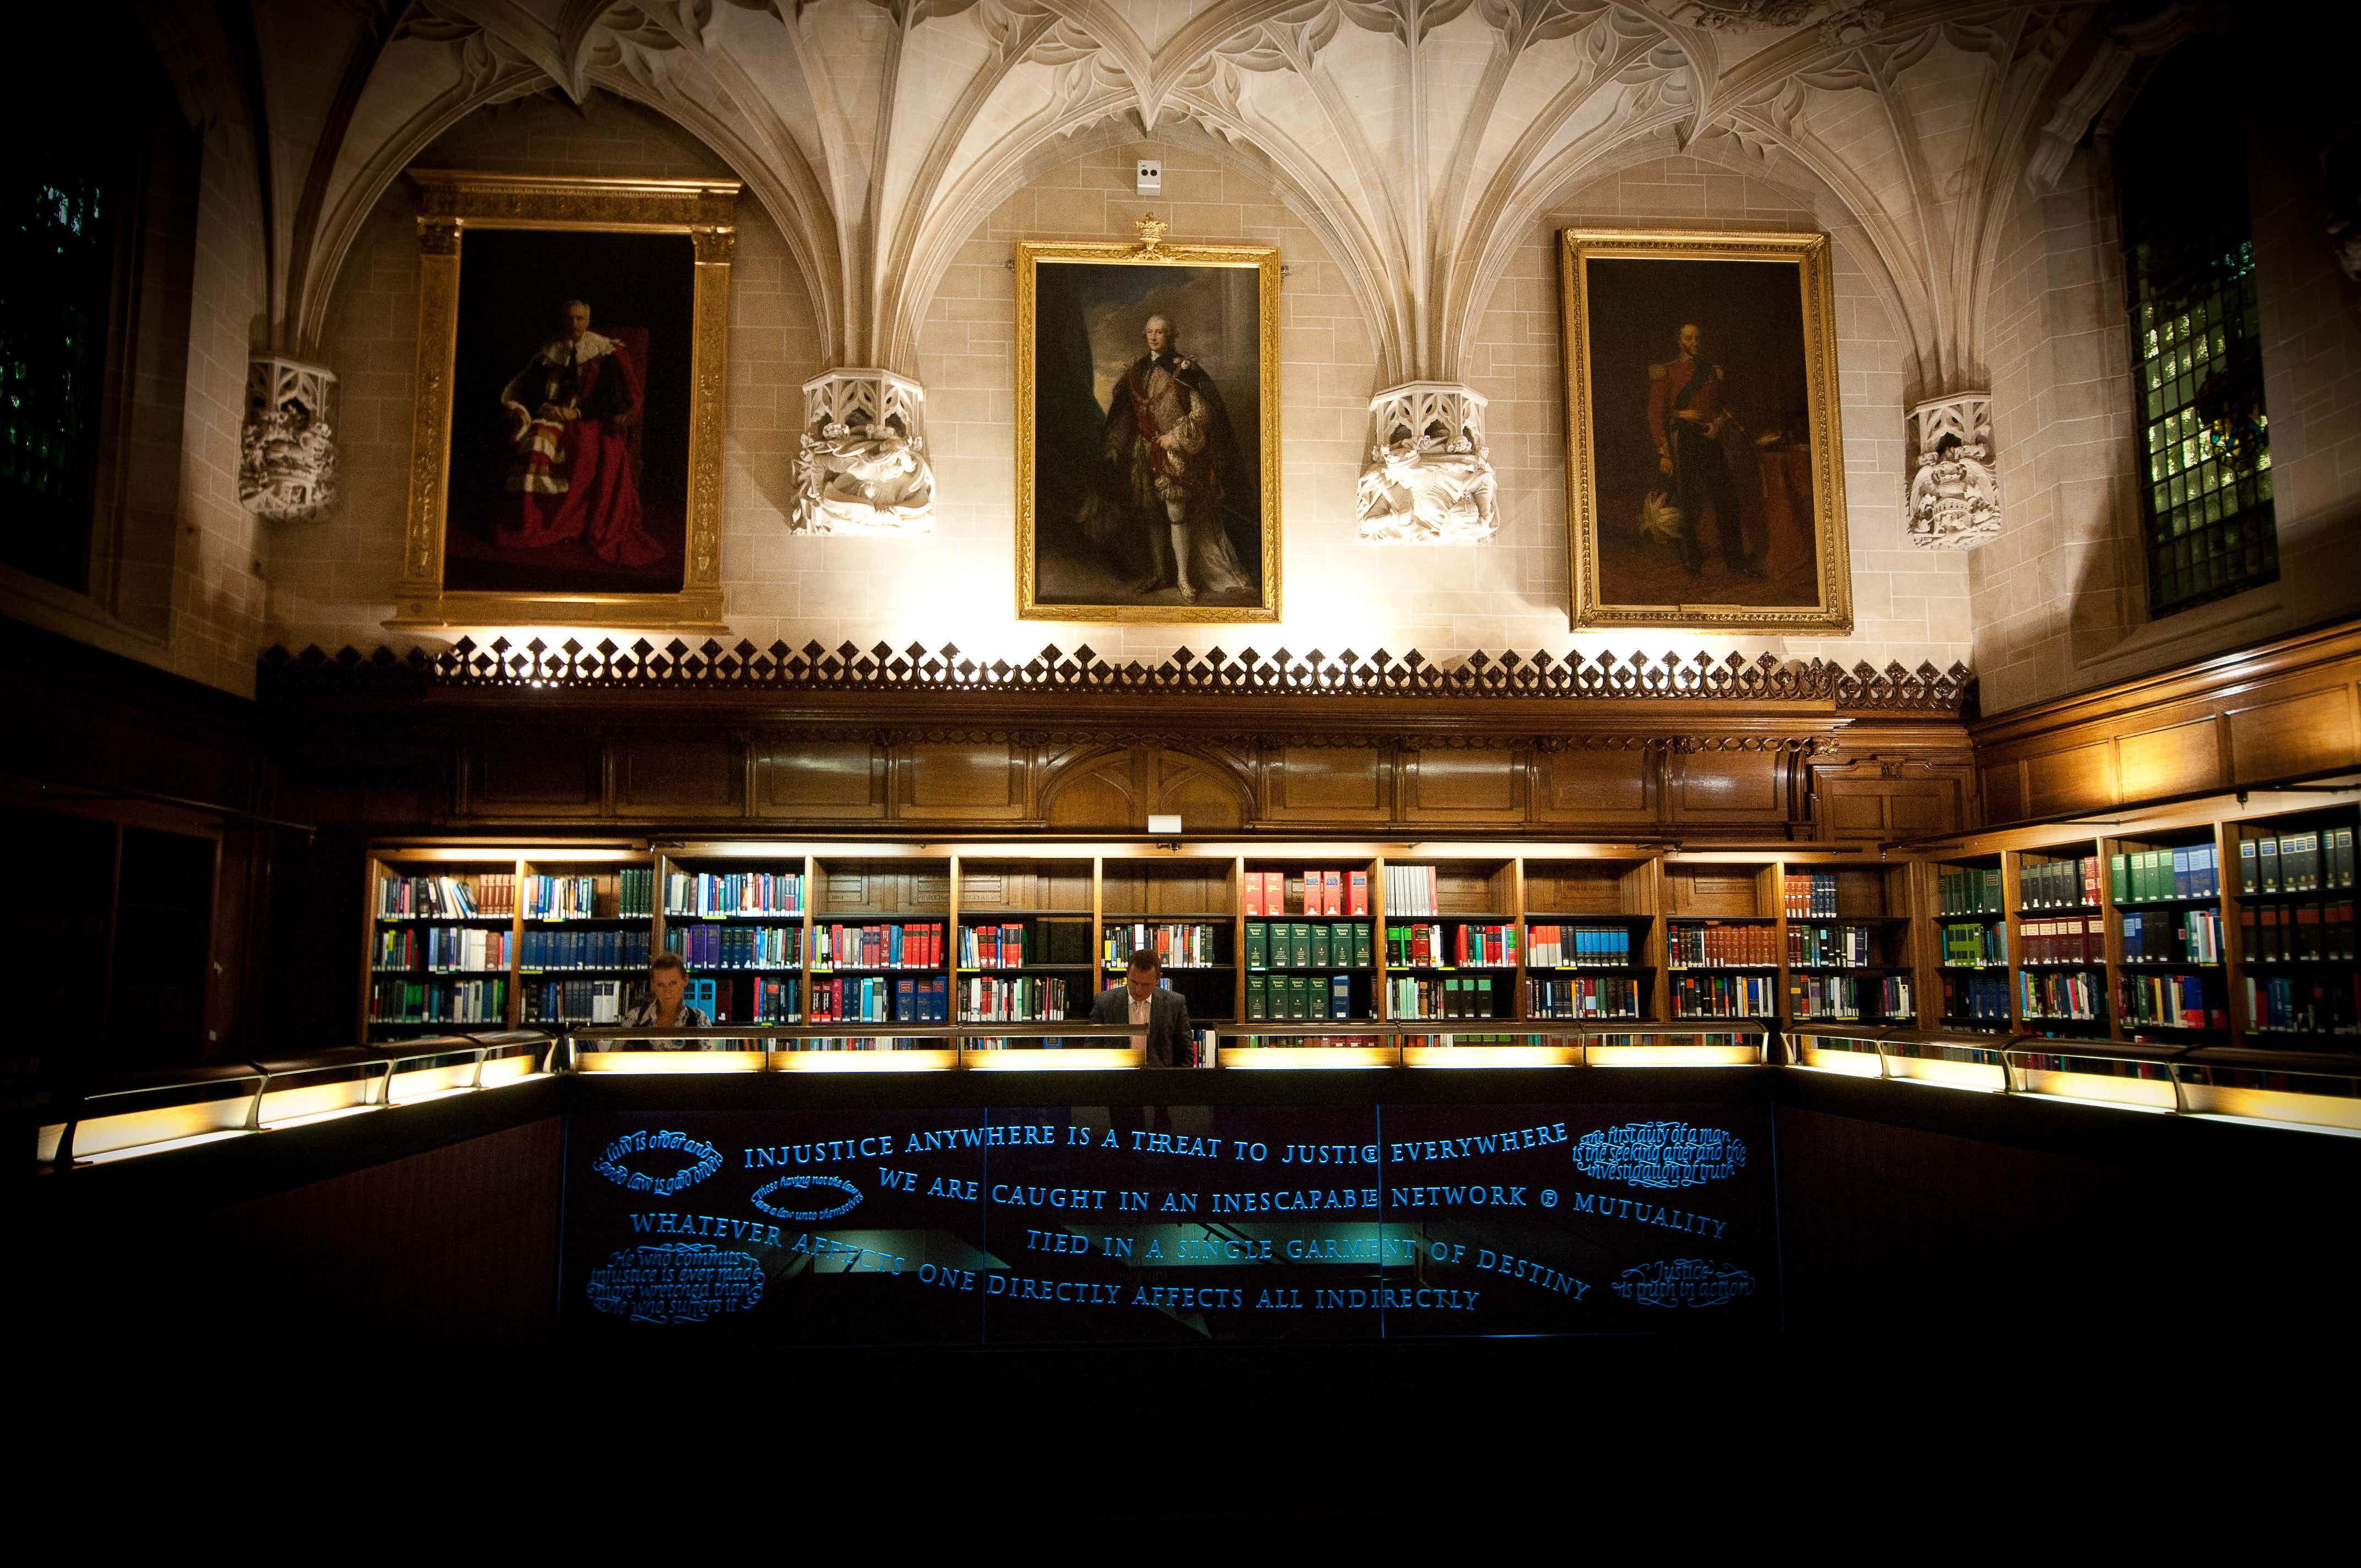 Whole Venue, The Supreme Court of the United Kingdom